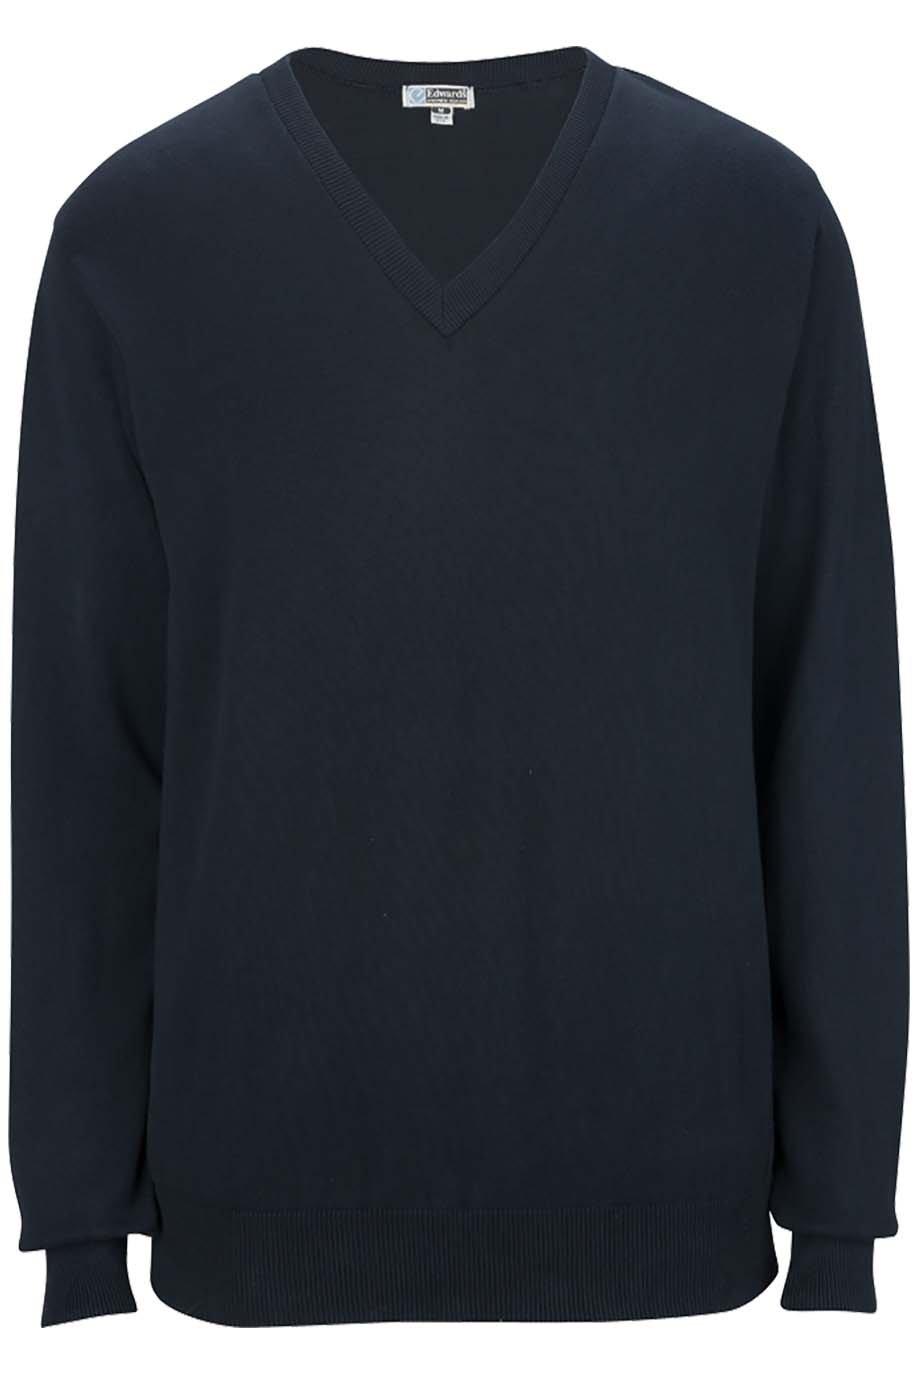 Edwards Ed Garment Men'S Fine Gauge Soft V Neck Cuff Cotton Sweater, Navy, 2XL